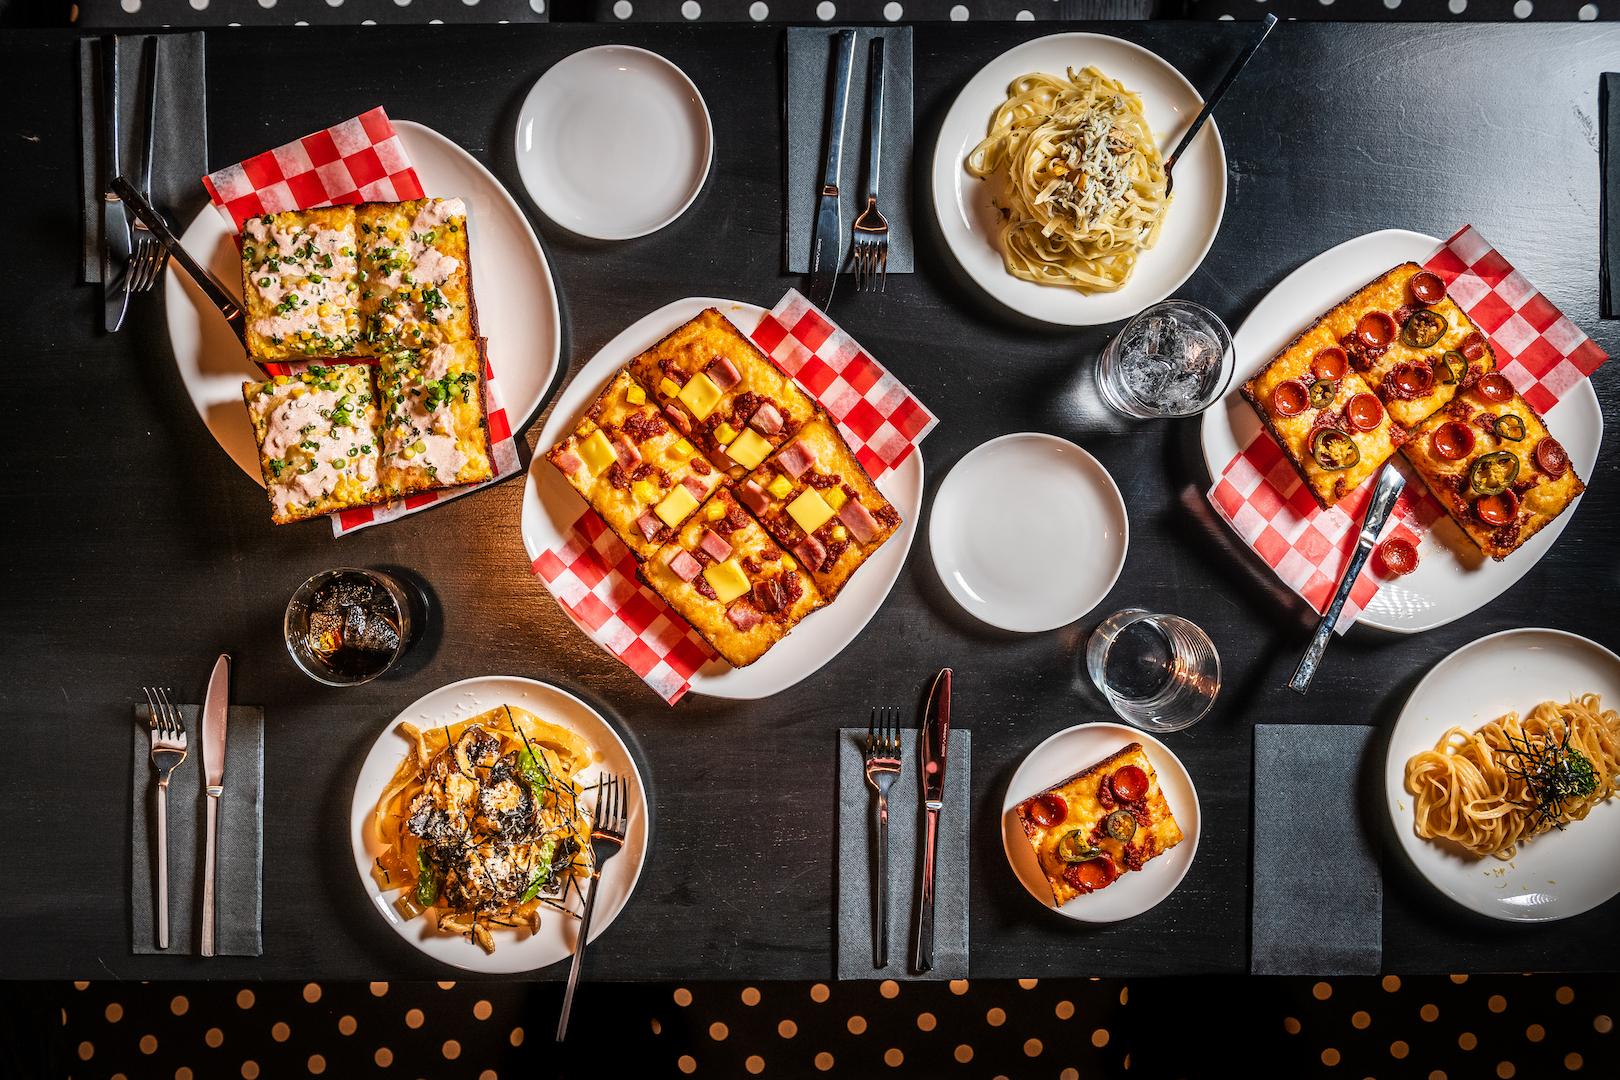 Tonari Pizza and Pasta Shot REY LOPEZ